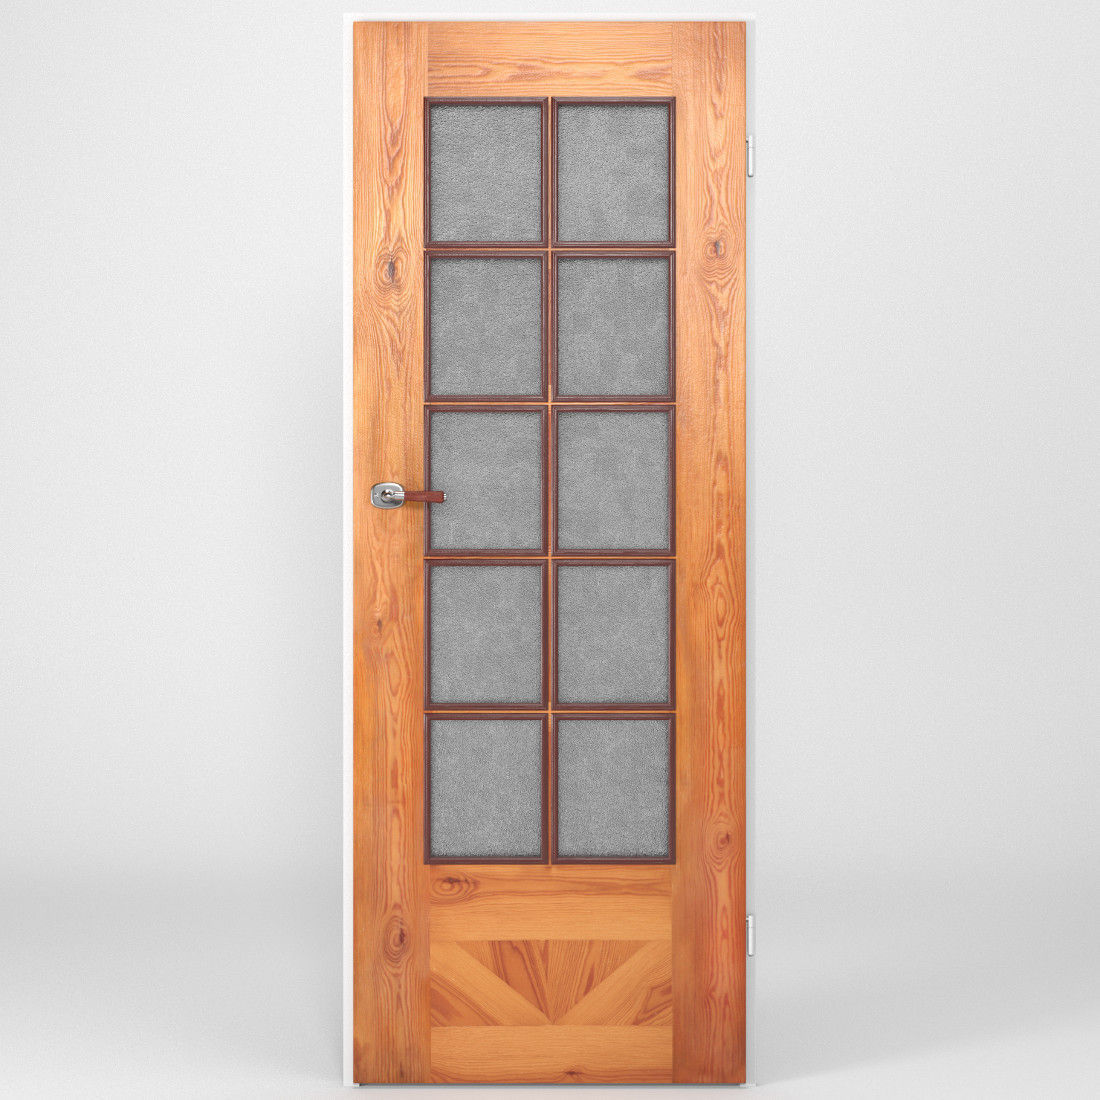 Wooden door 3d model rigged obj fbx blend for Door 3d model